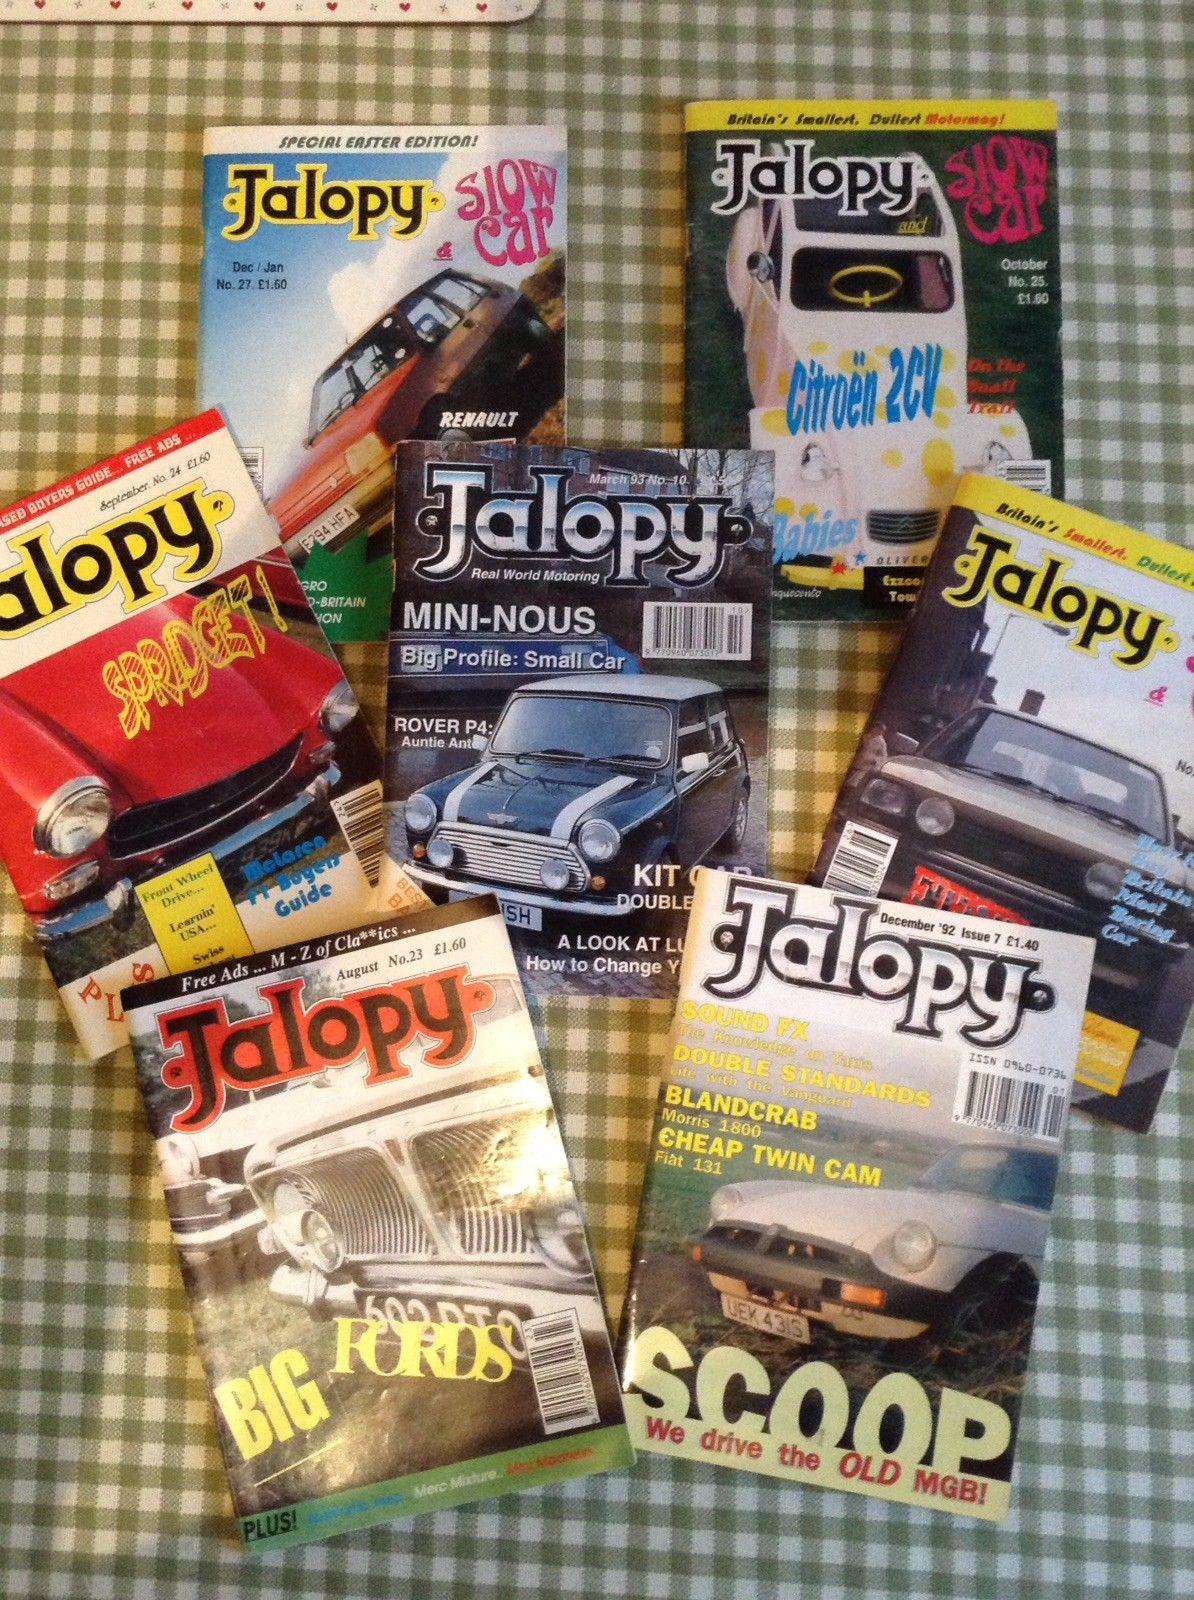 Jalopy - Ebay sale May 2018.jpg